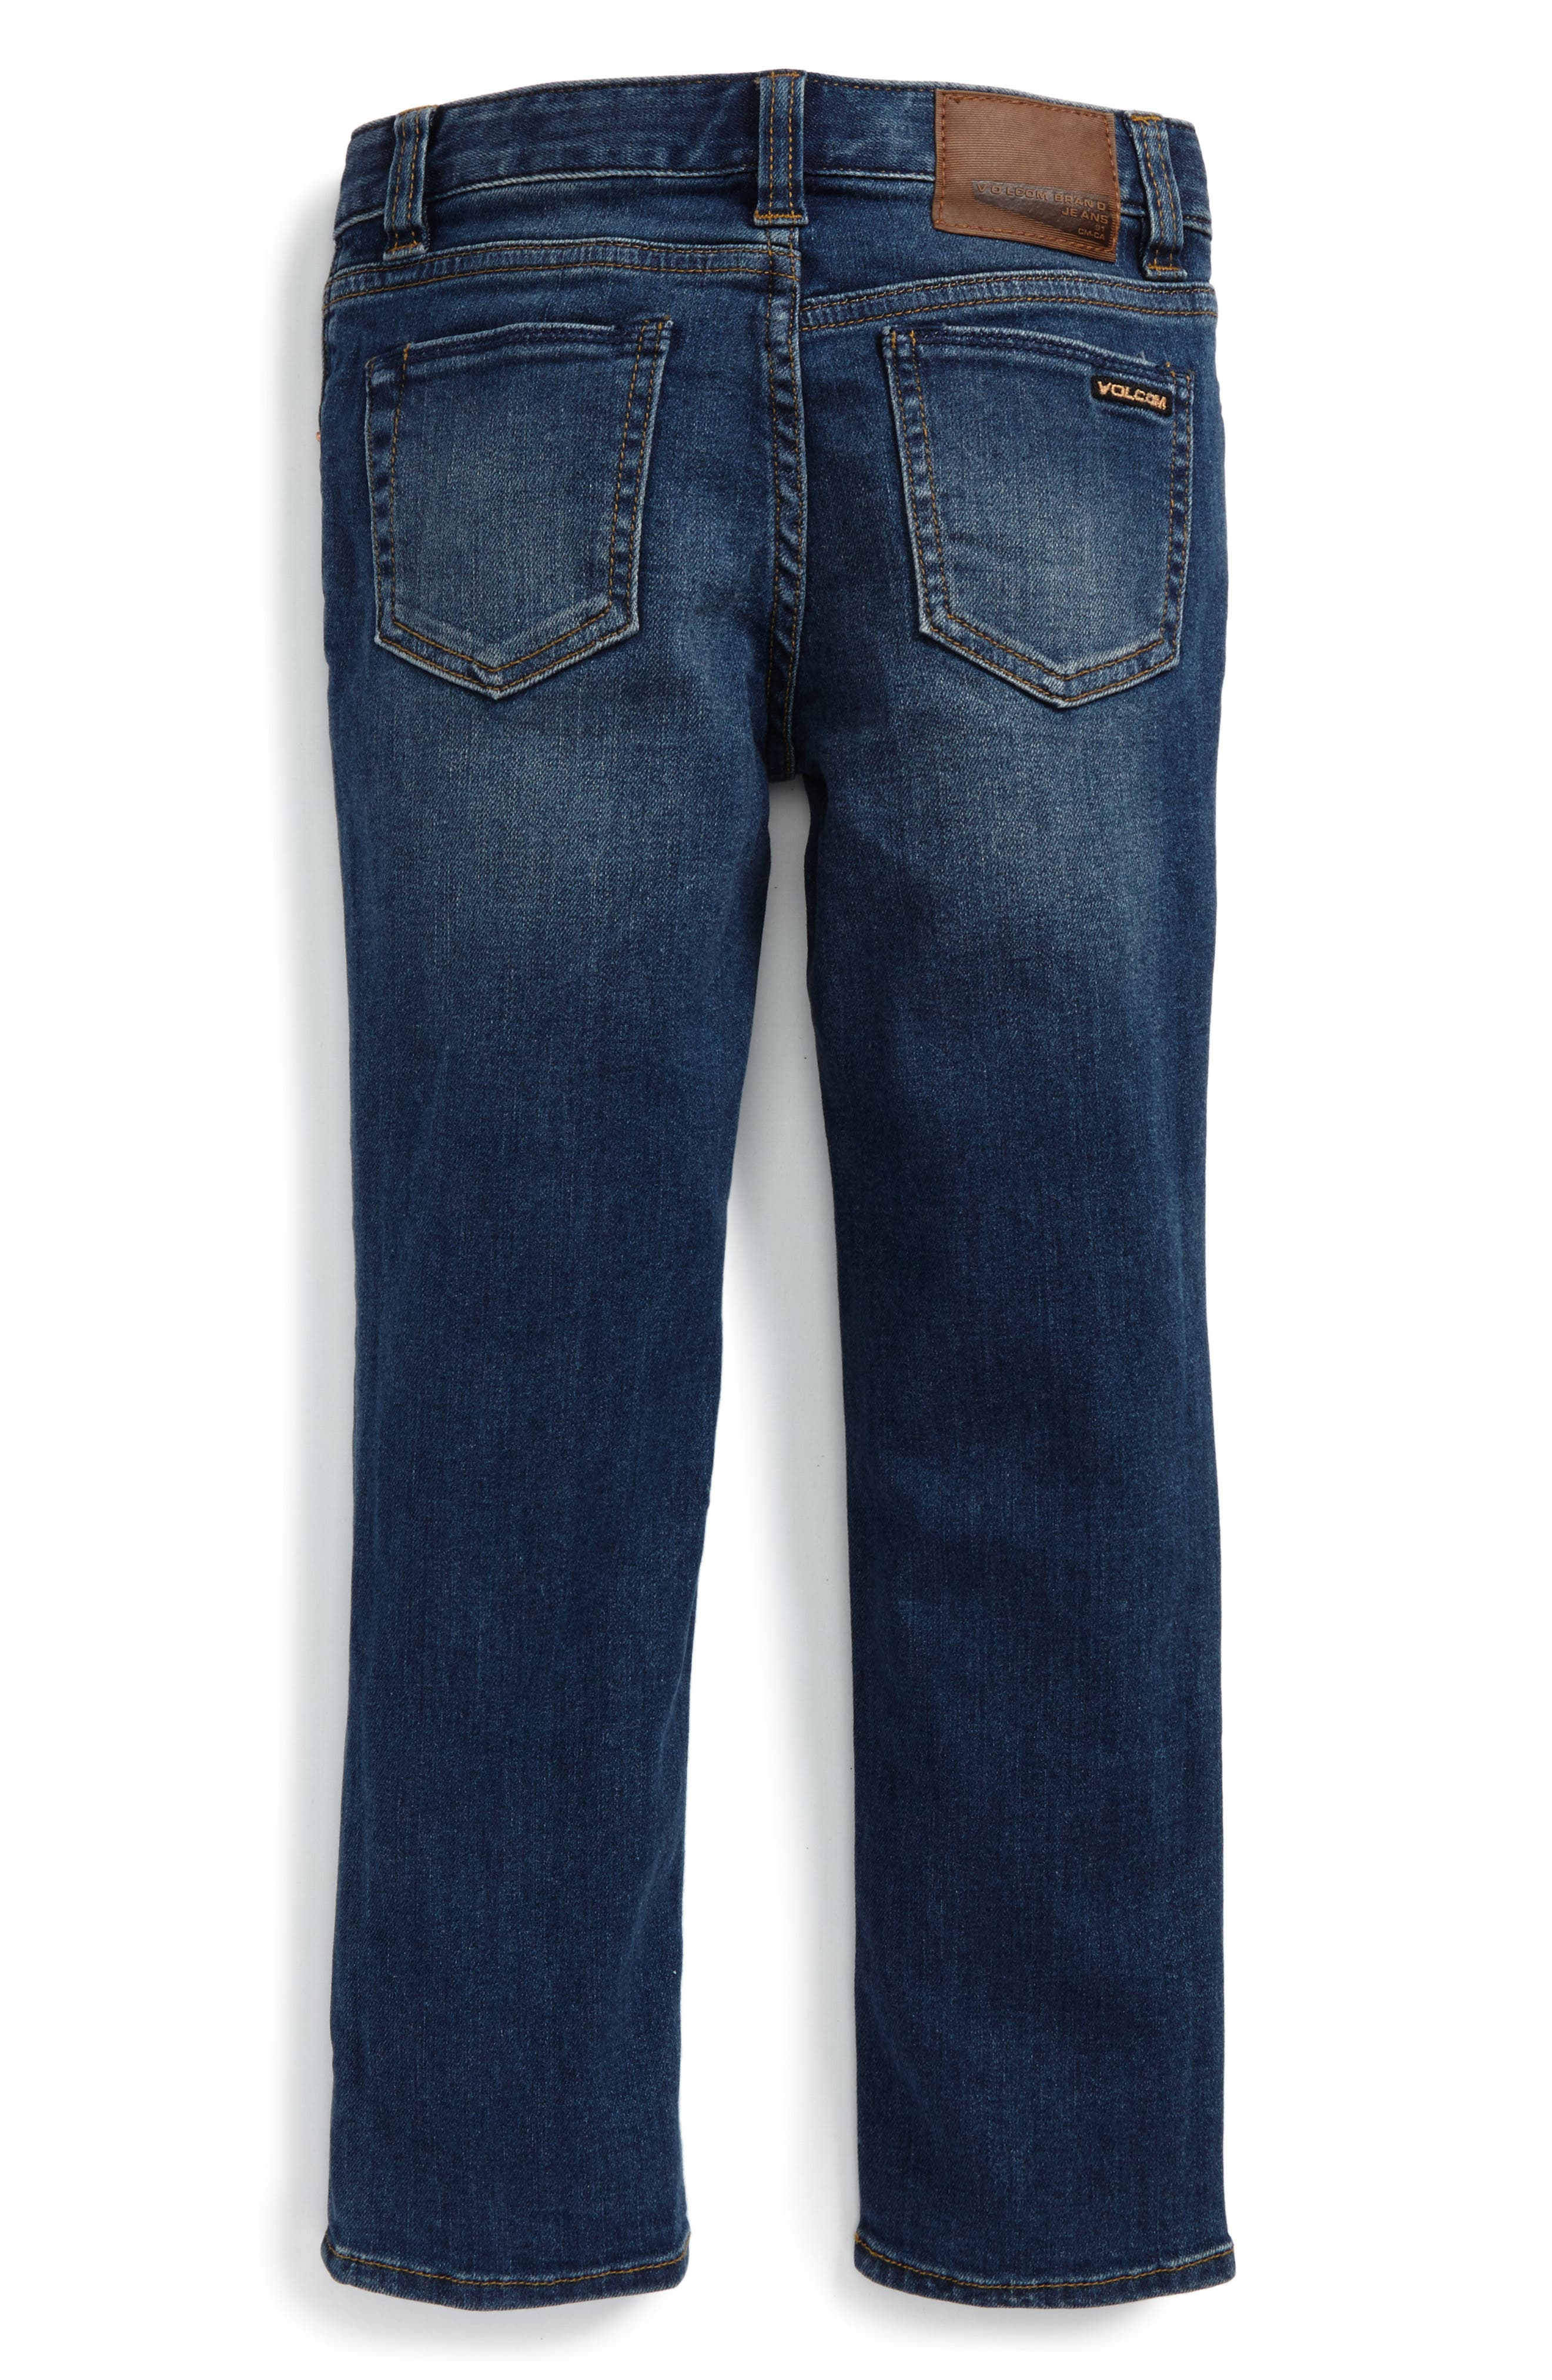 Alternate Image 2  - Volcom 'Vorta' Slim Fit Jeans (Toddler Boys & Little Boys)